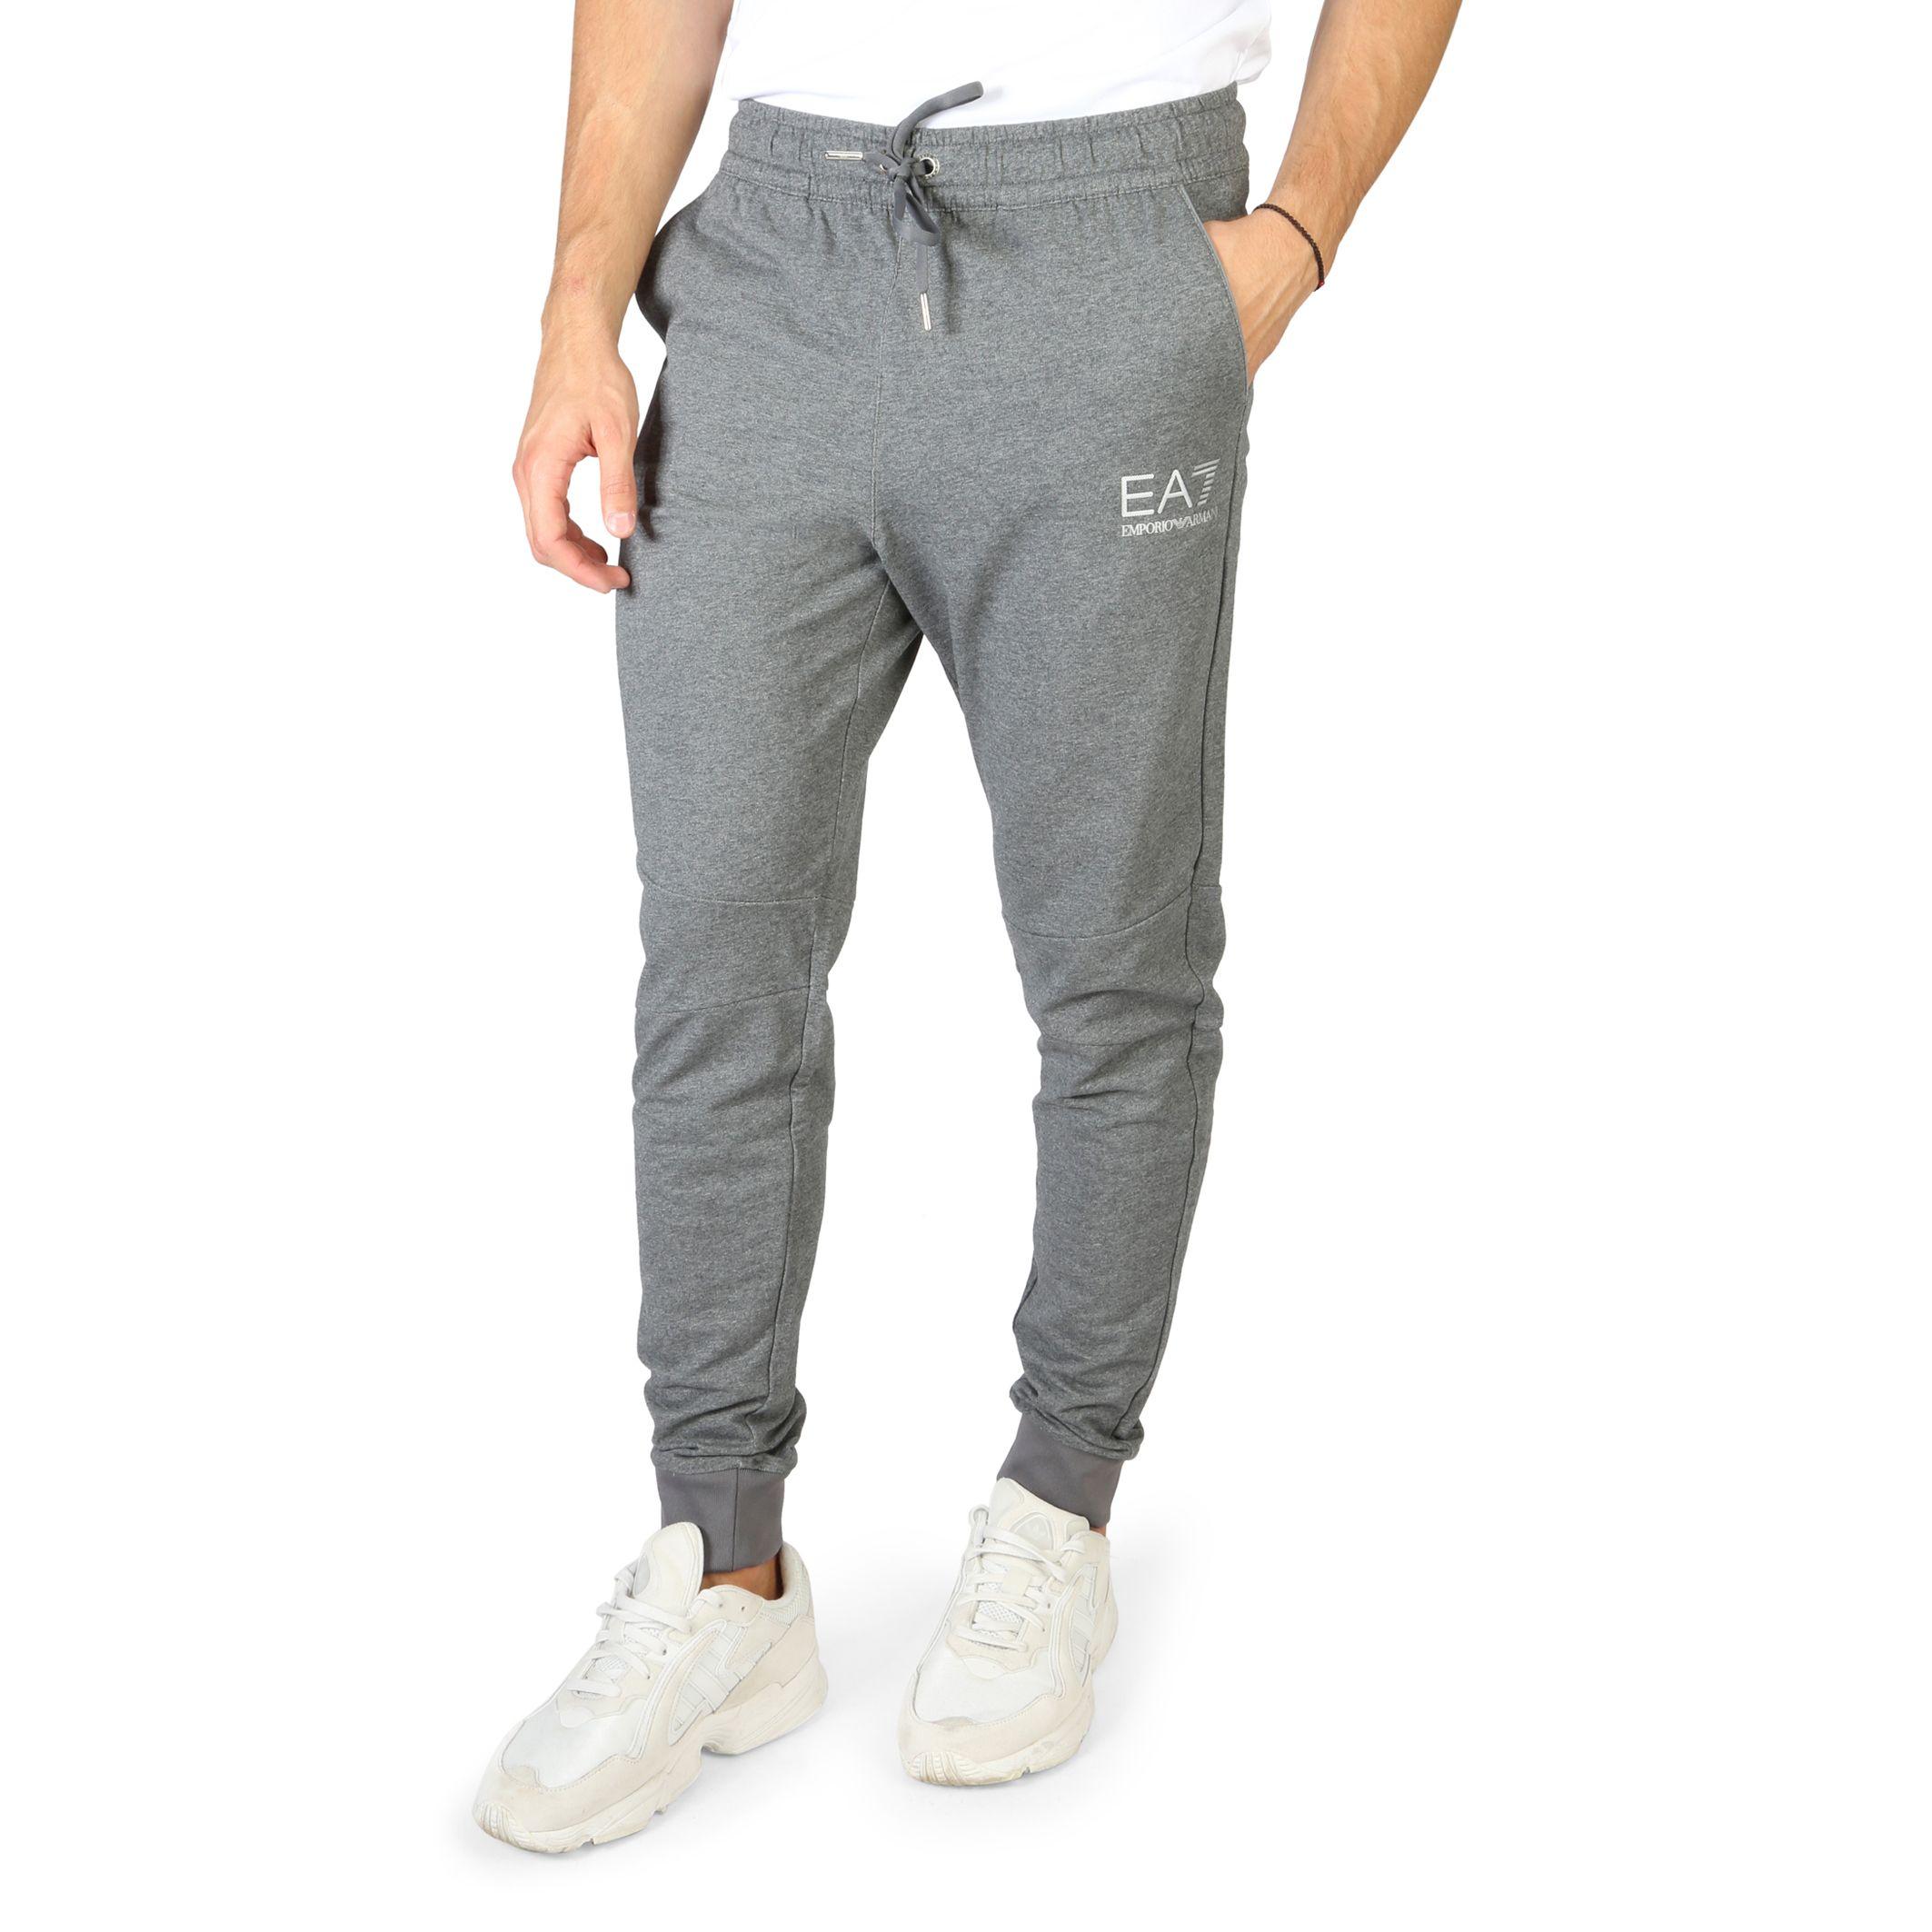 Clothing EA7 – 6ZPP65_PJ60Z